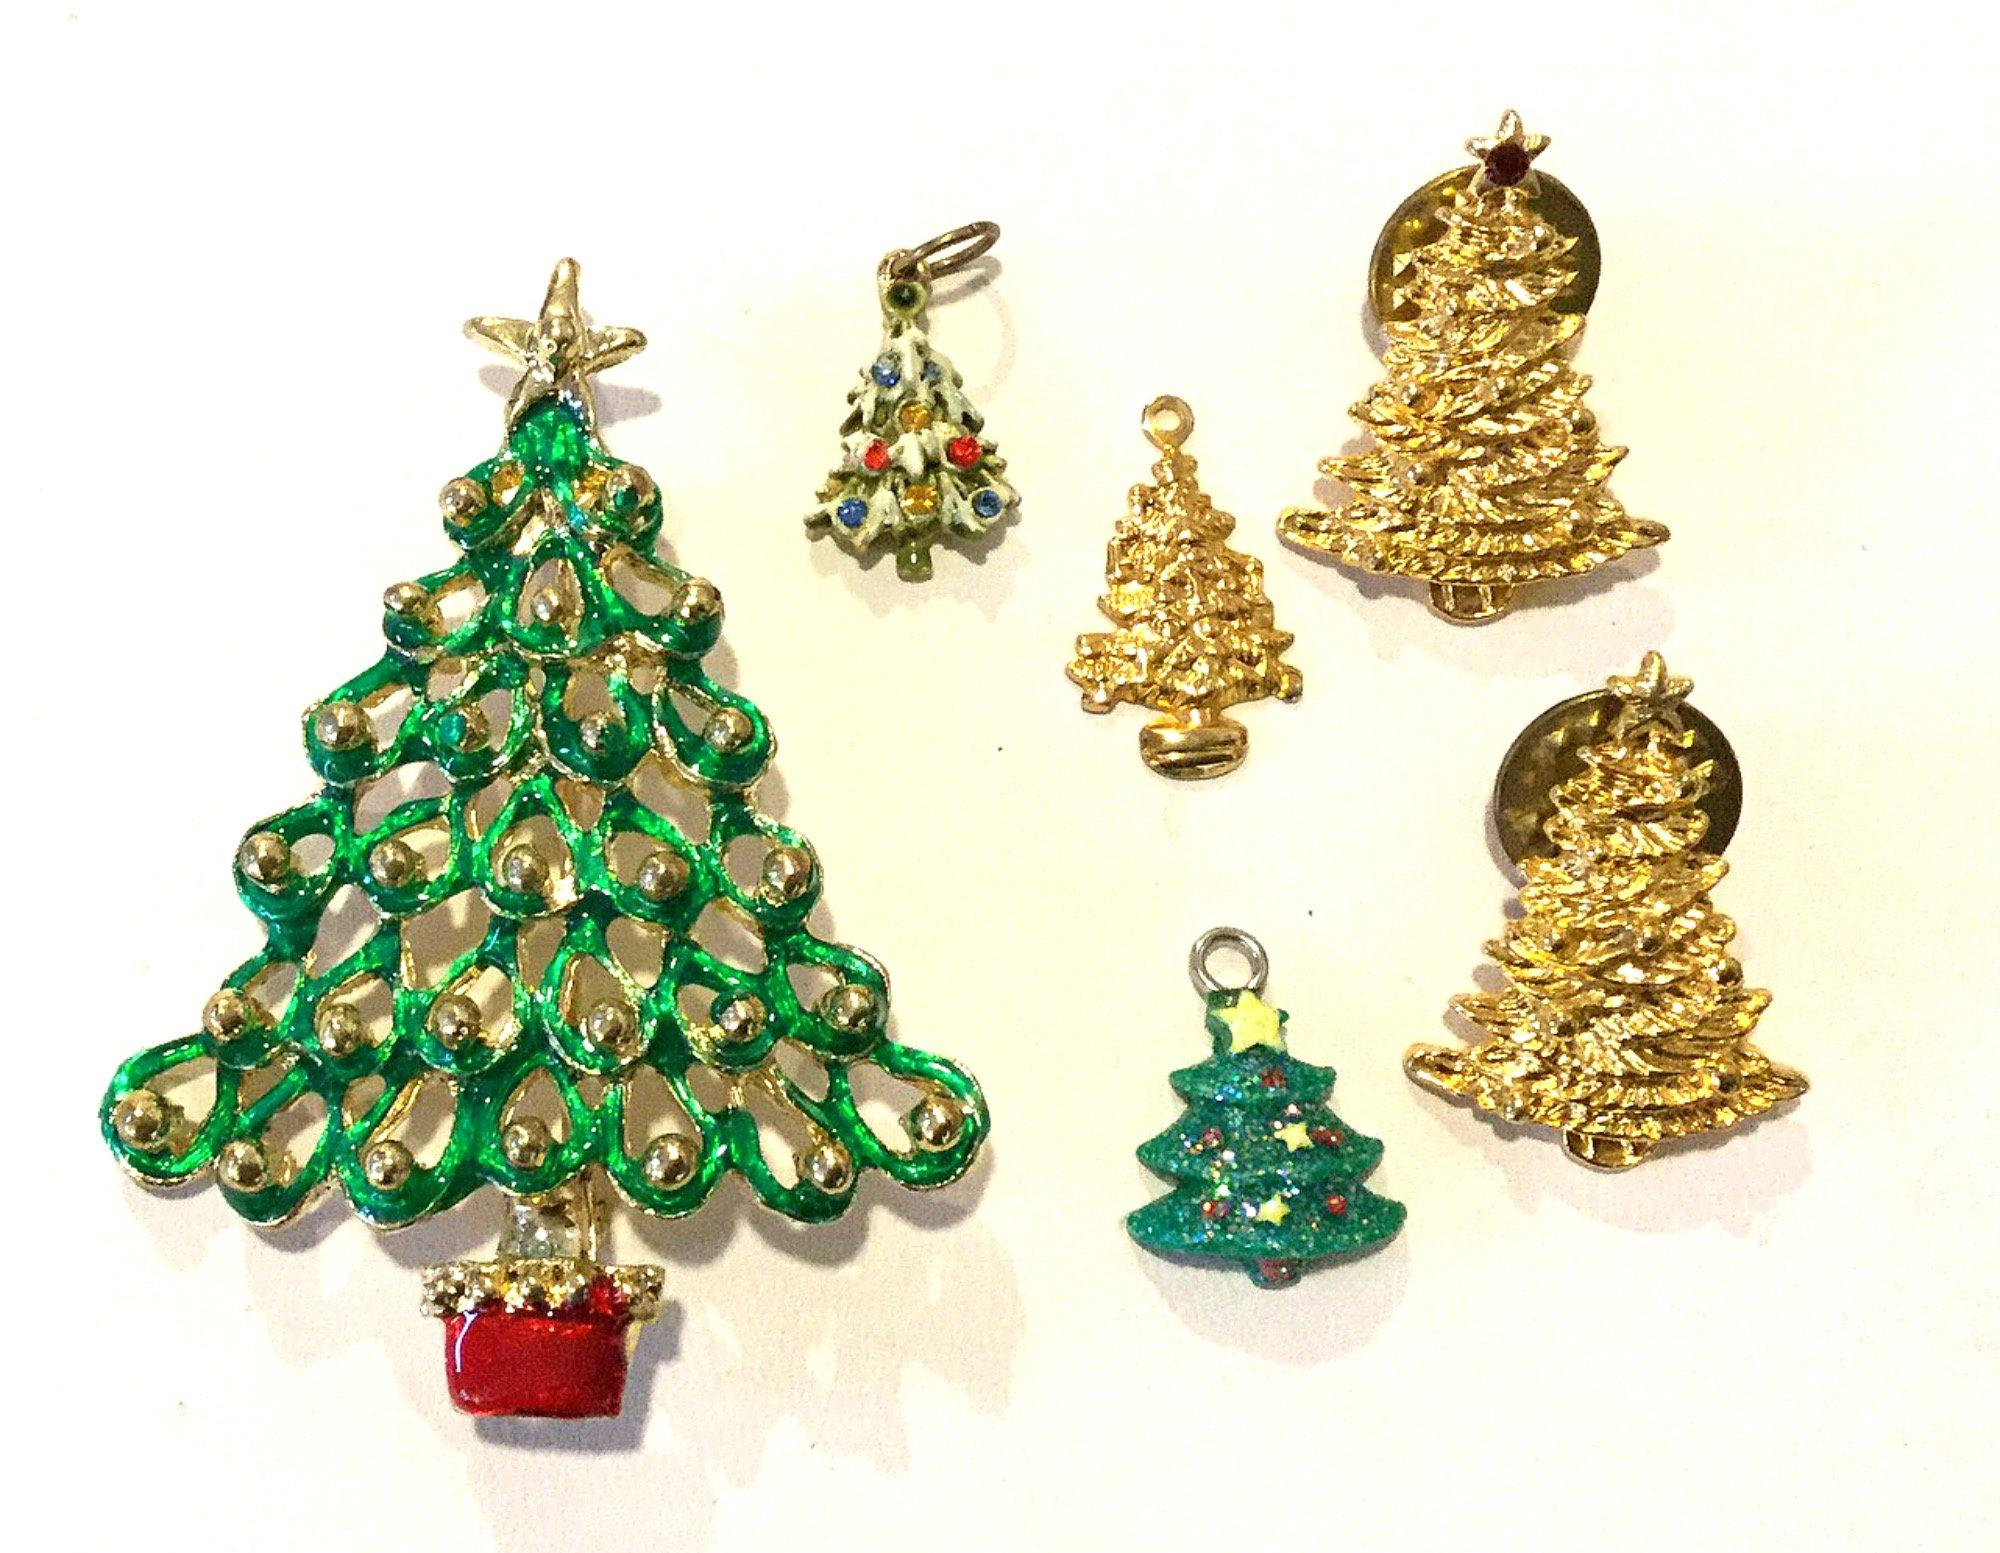 Christmas Trees SIX Vintage Rhinestone Enamel Costume Jewelry Pins and Charm Pendants